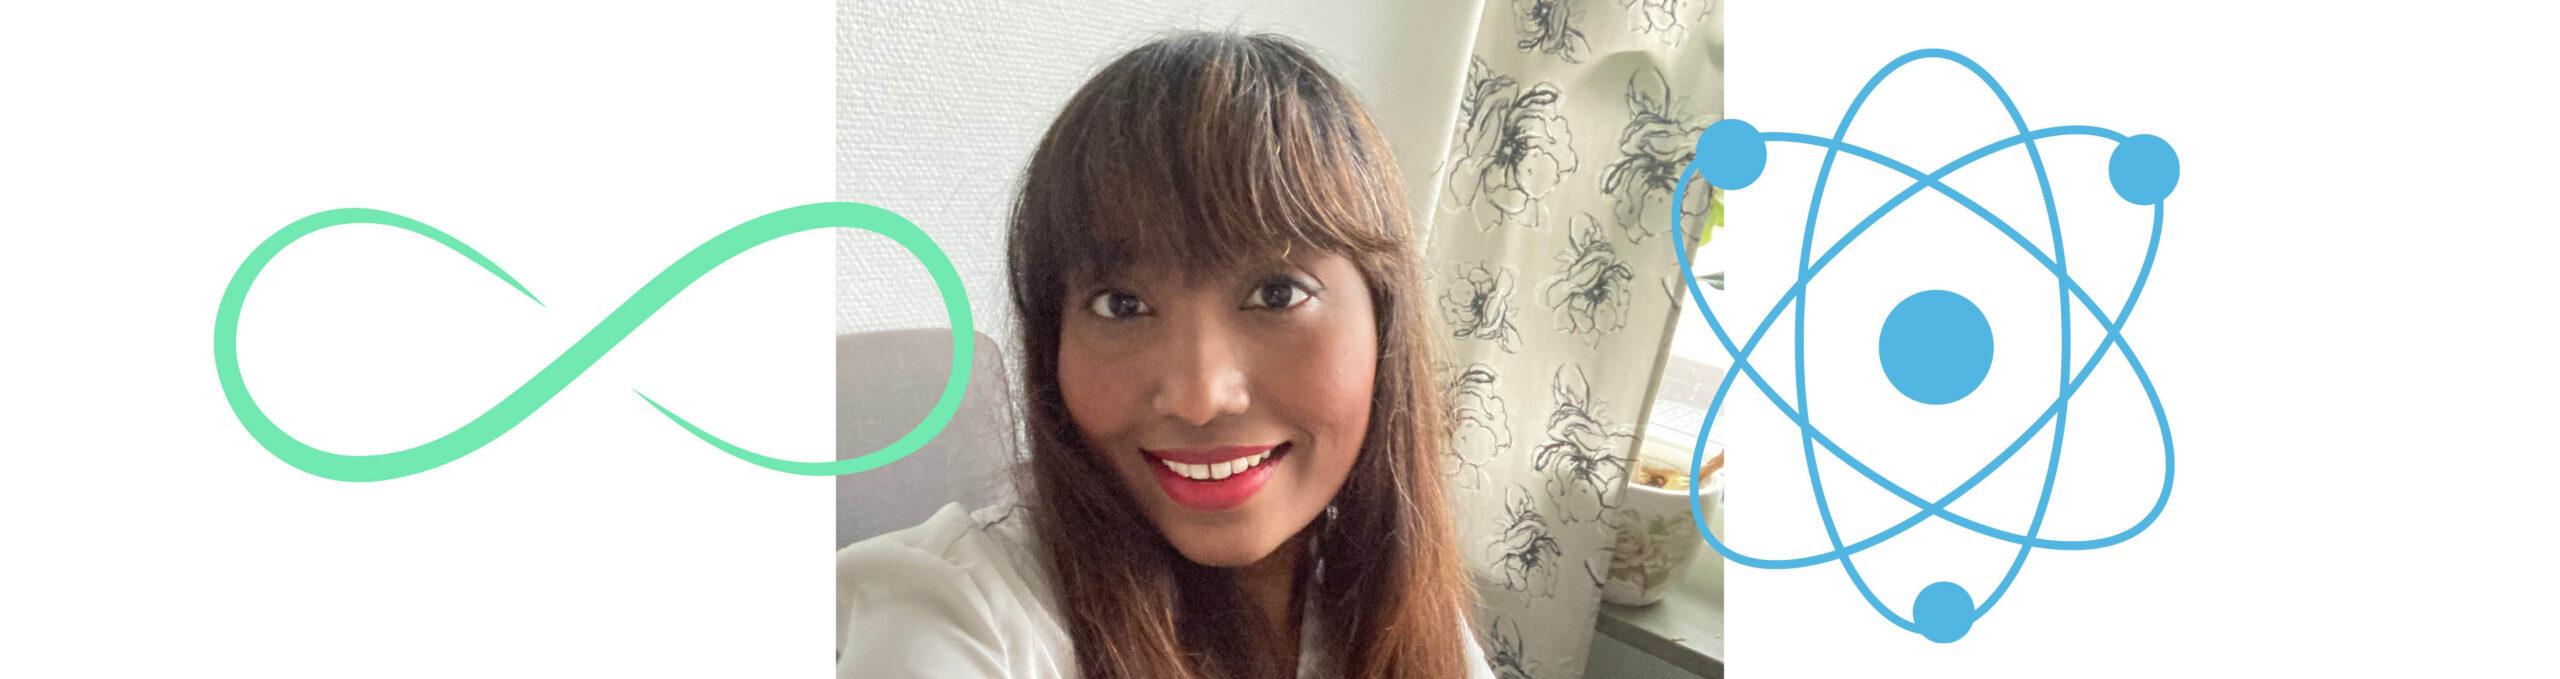 Solid Online | Technisch consultant | Kavitha Krishnan | Technical consultant